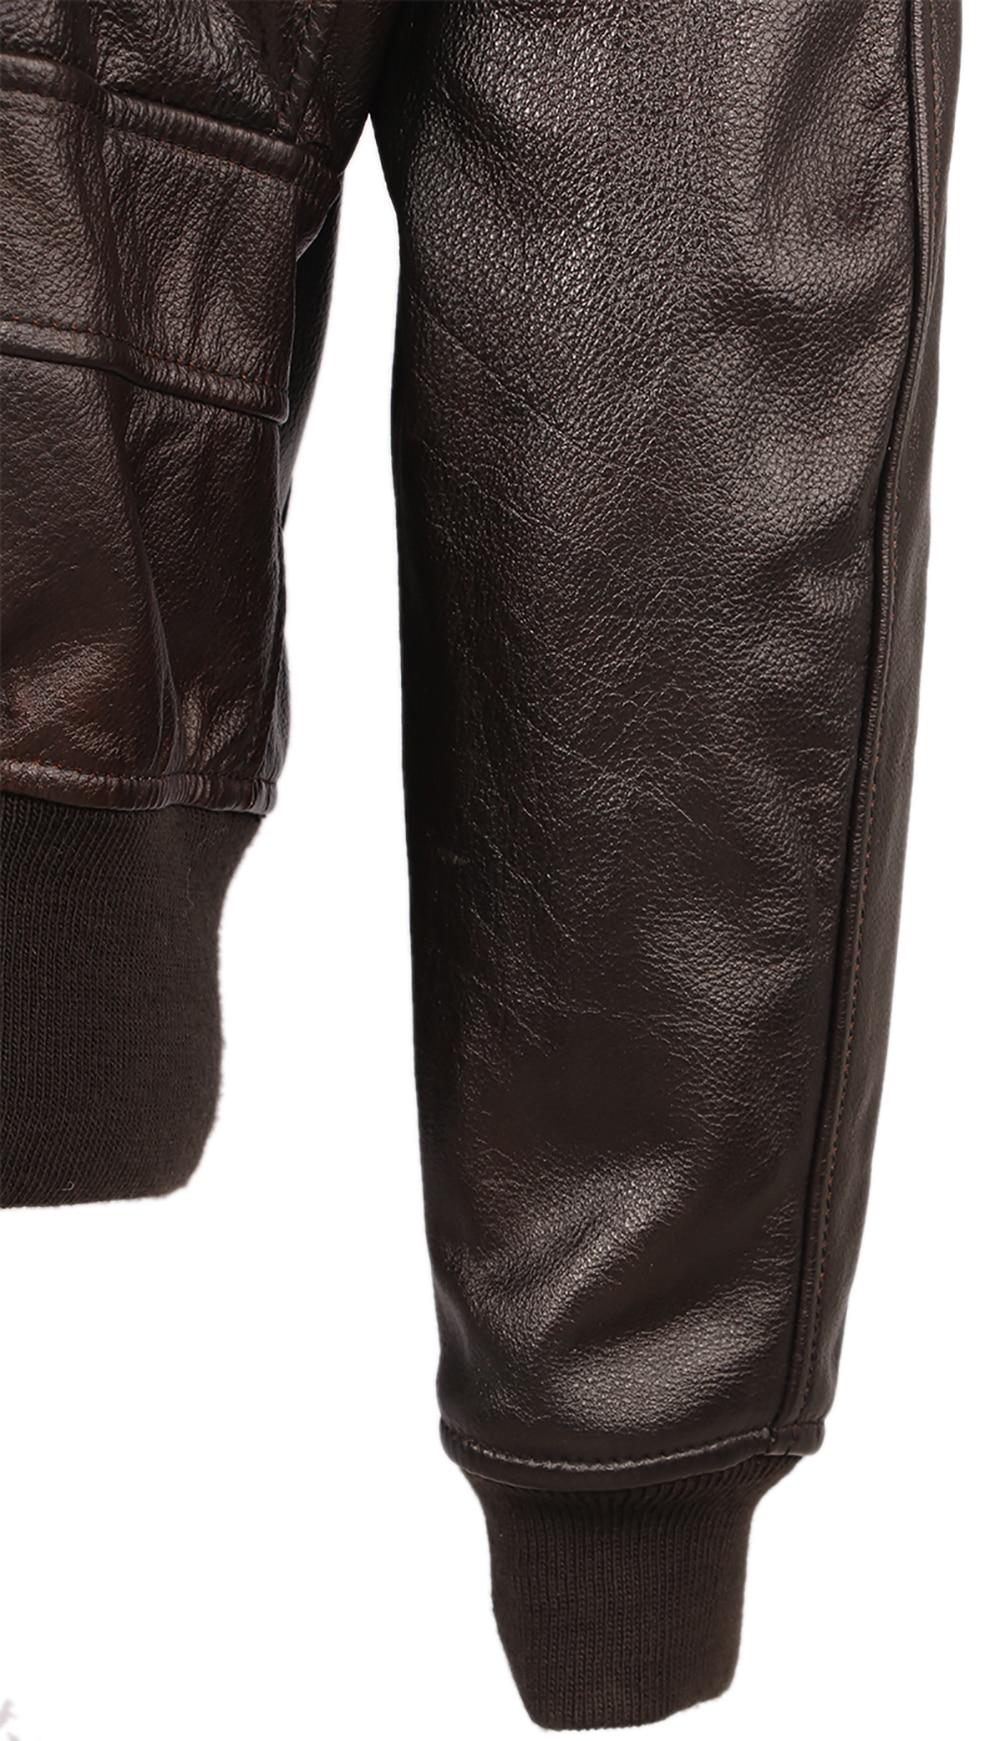 H503e3189783f417f901b17cd2fc1d411N Vintage Distressed Men Leather Jacket Quilted Fur Collar 100% Calfskin Flight Jacket Men's Leather Jacket Man Winter Coat M253